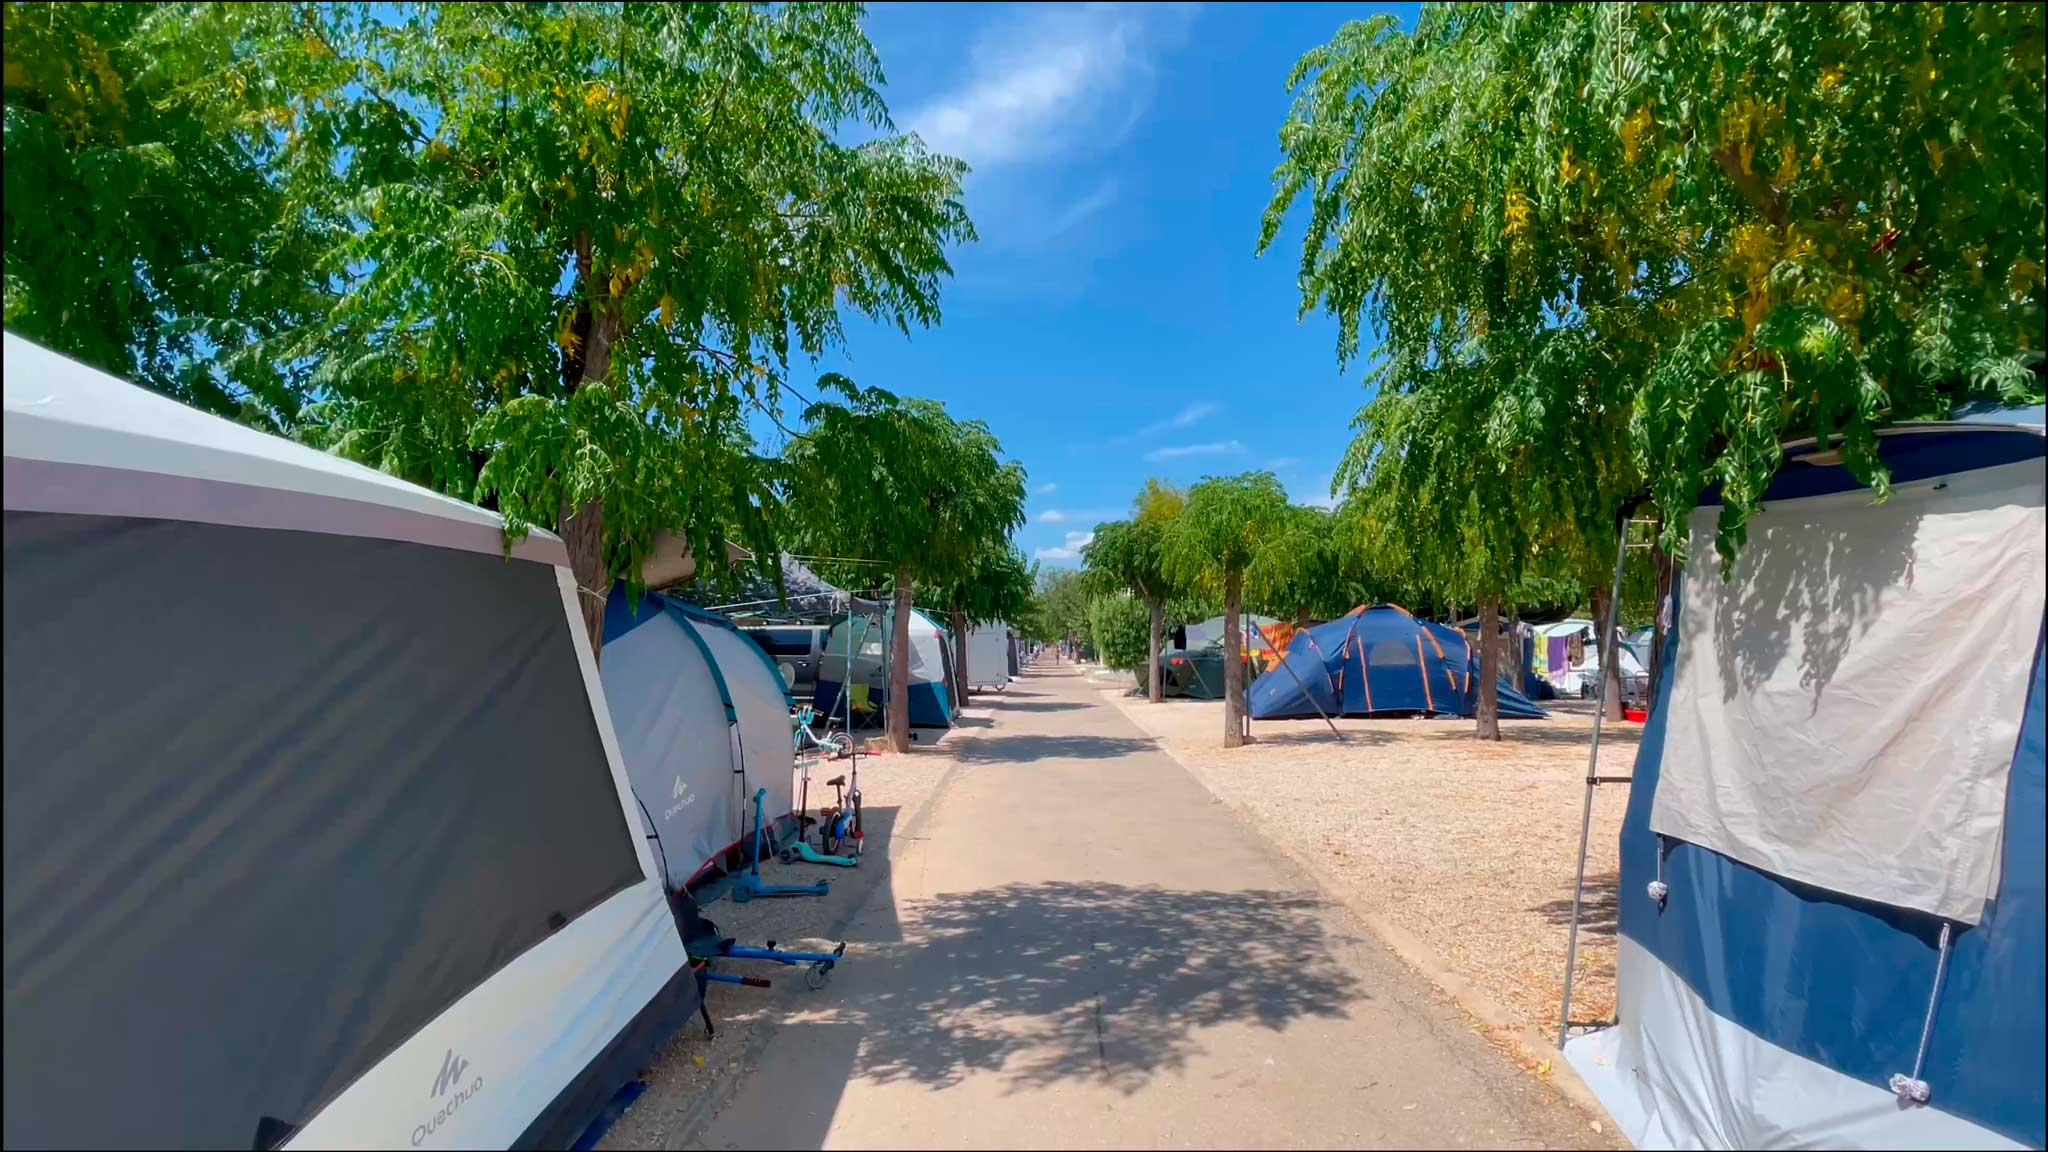 Camping Javea tiendas – Camping Javea